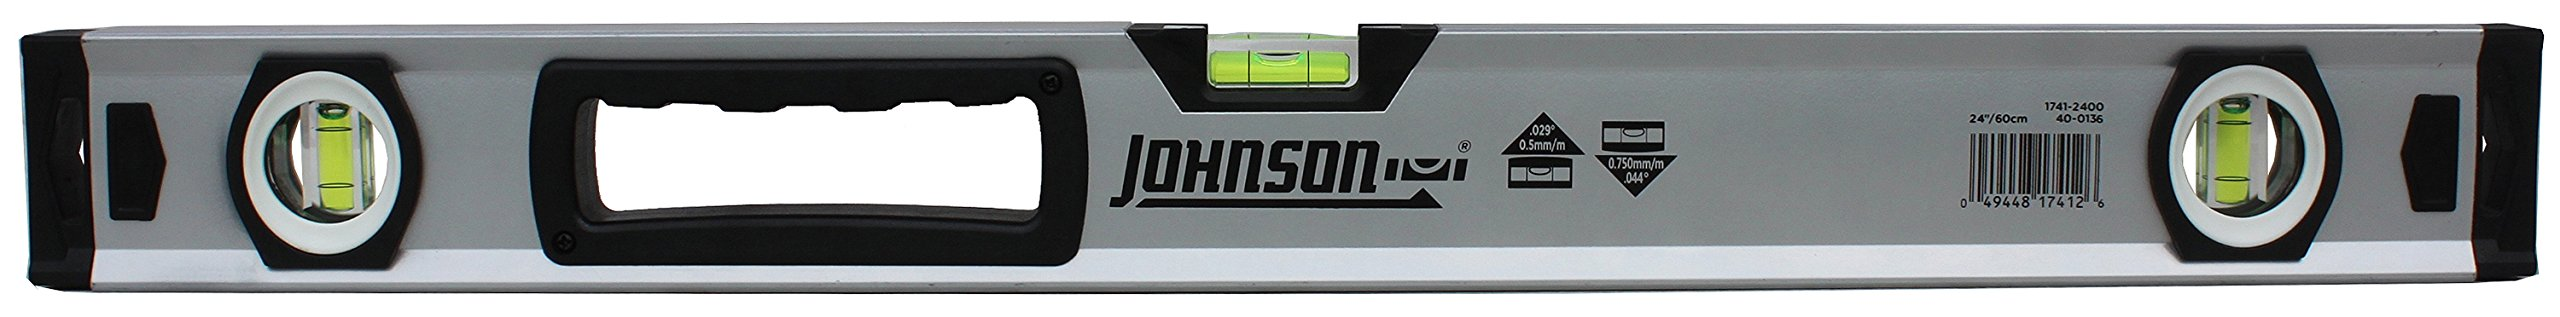 Johnson Level & Tool 1741-2400 Aluminum Box Level, 24''